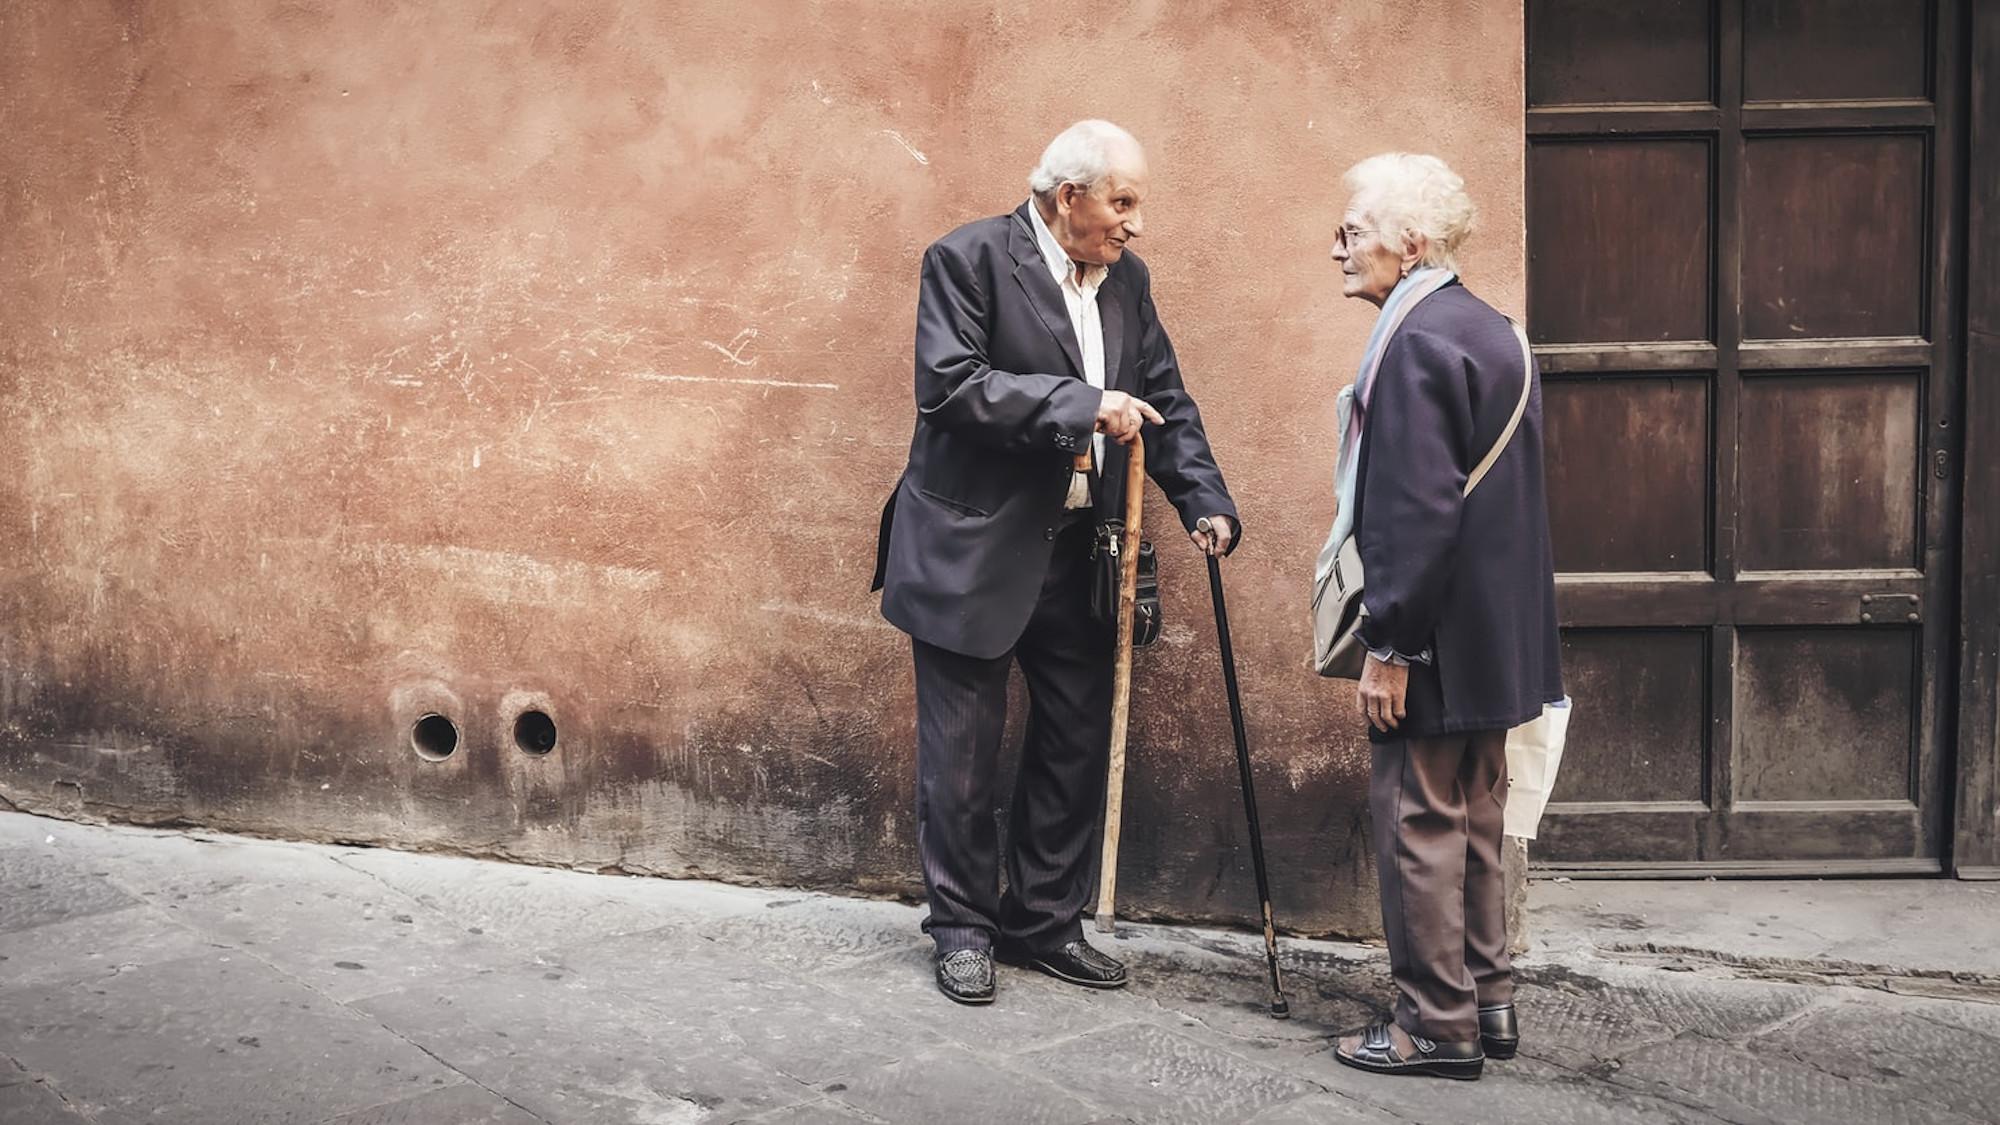 Elderly people on street